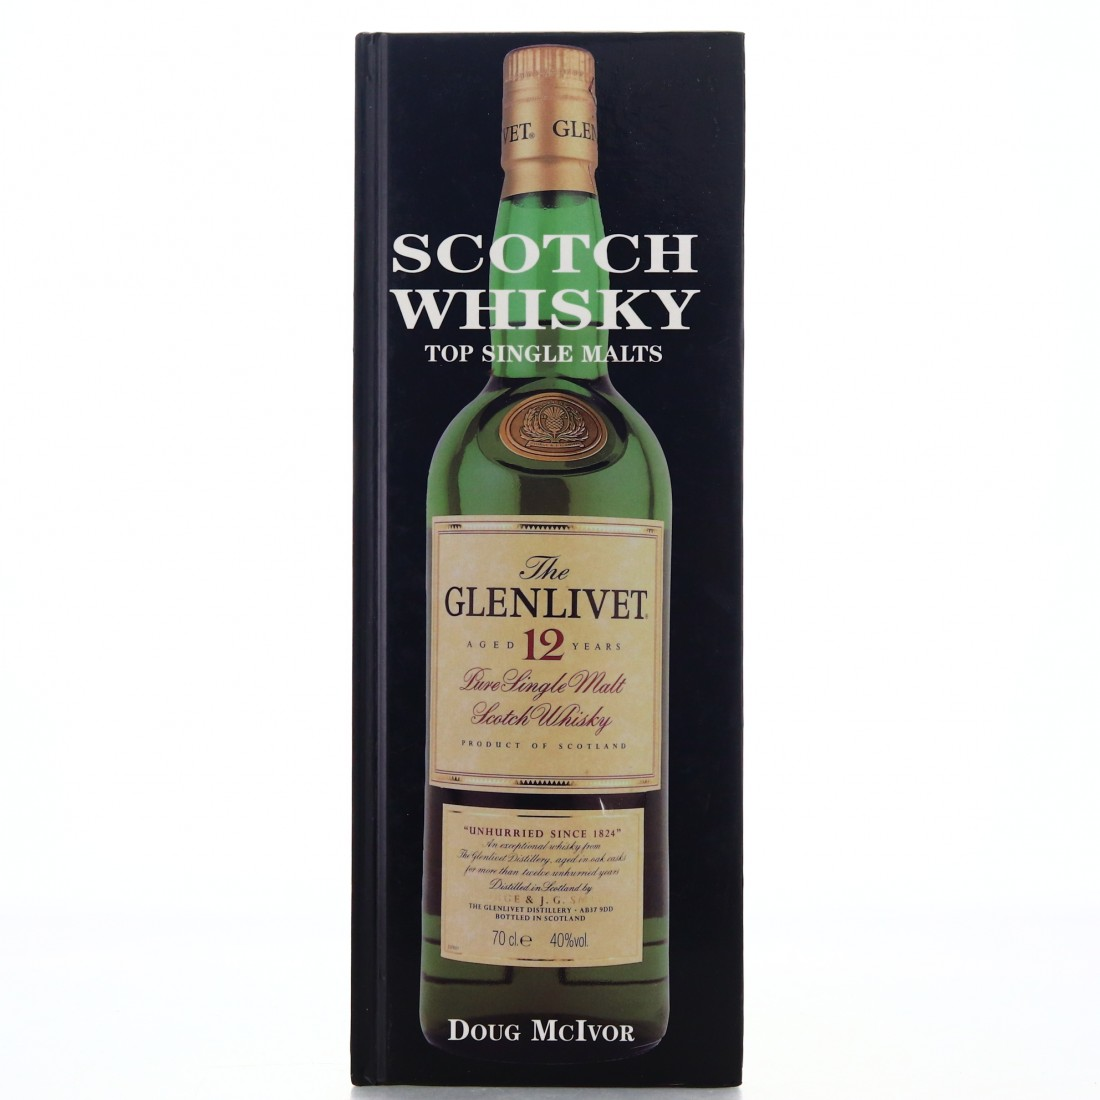 Scotch Whisky Top Single Malts Book